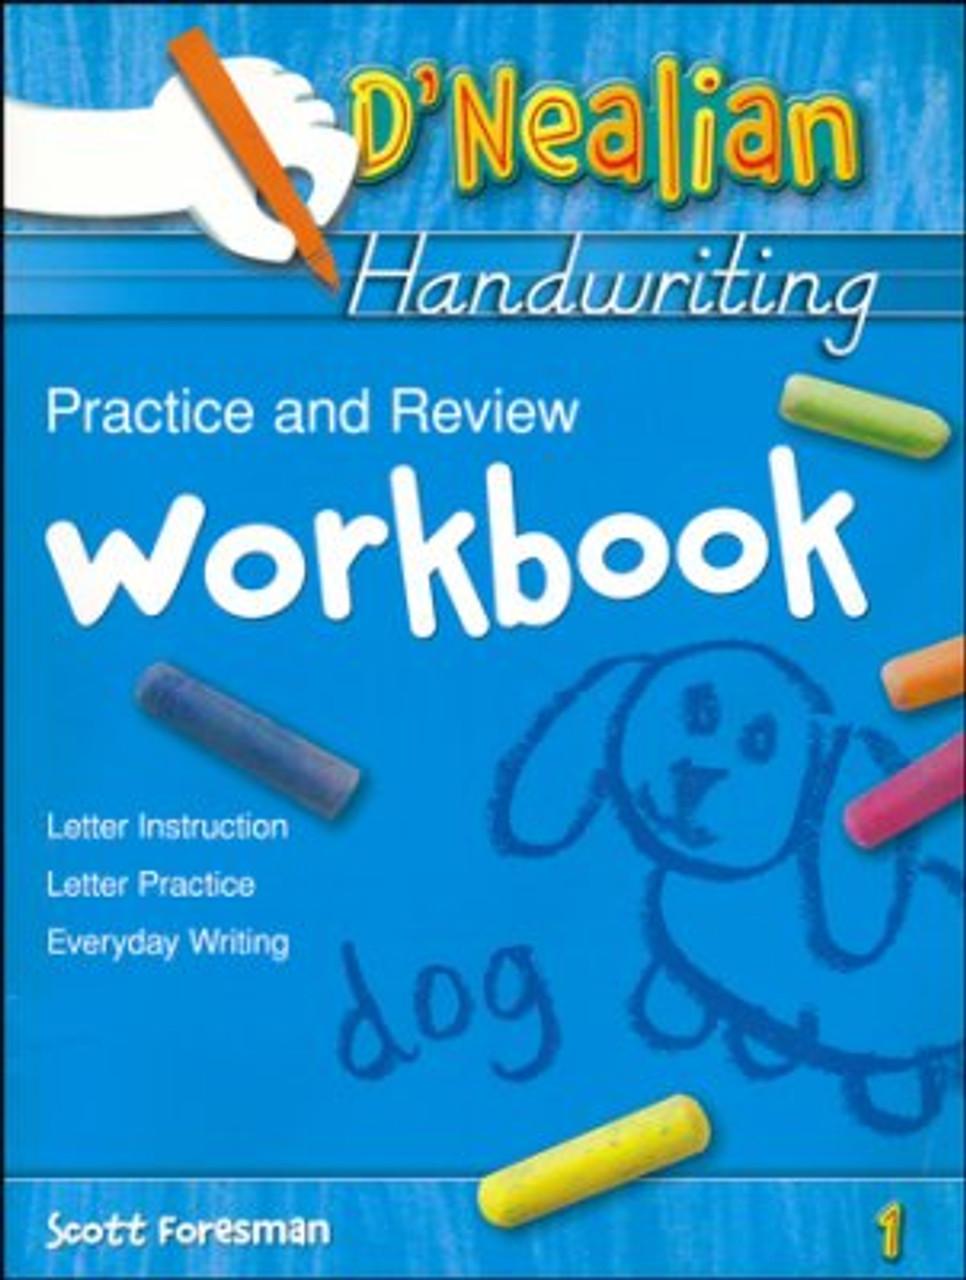 D'Nealian Handwriting Grade 1 Practice and Review Student Workbook -  Classroom Resource Center [ 1280 x 966 Pixel ]